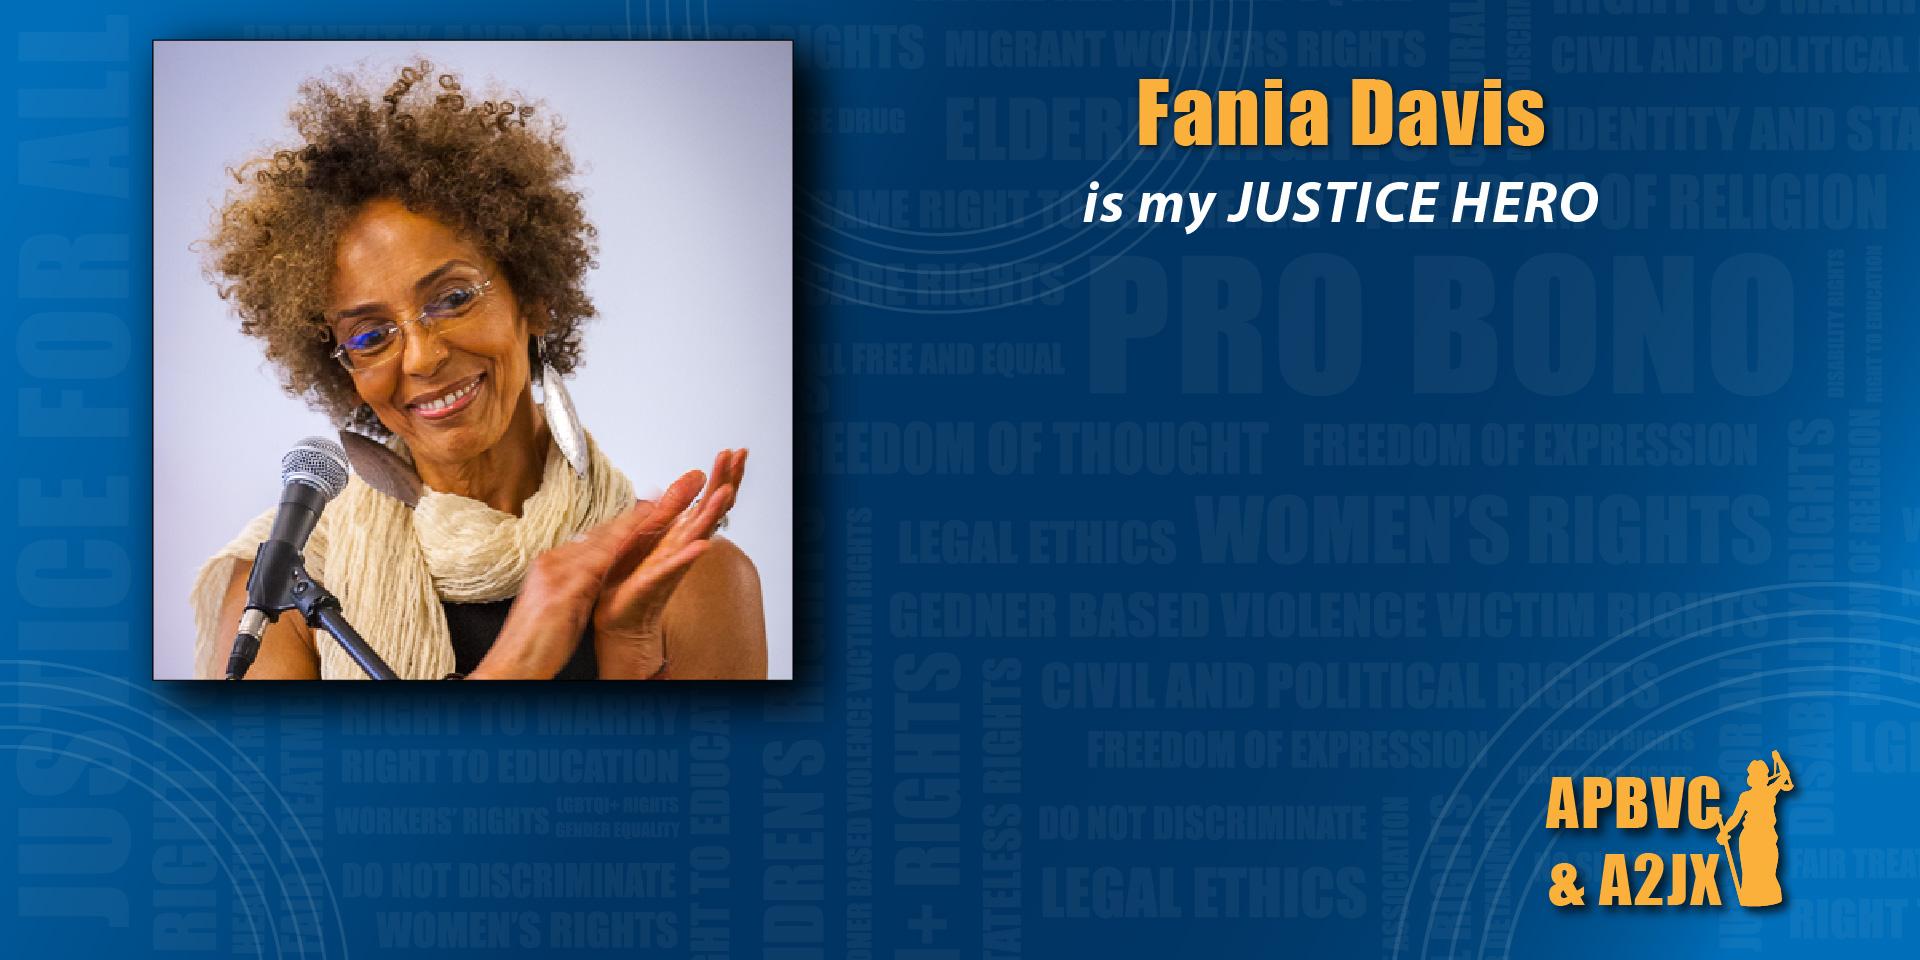 Fania Davis